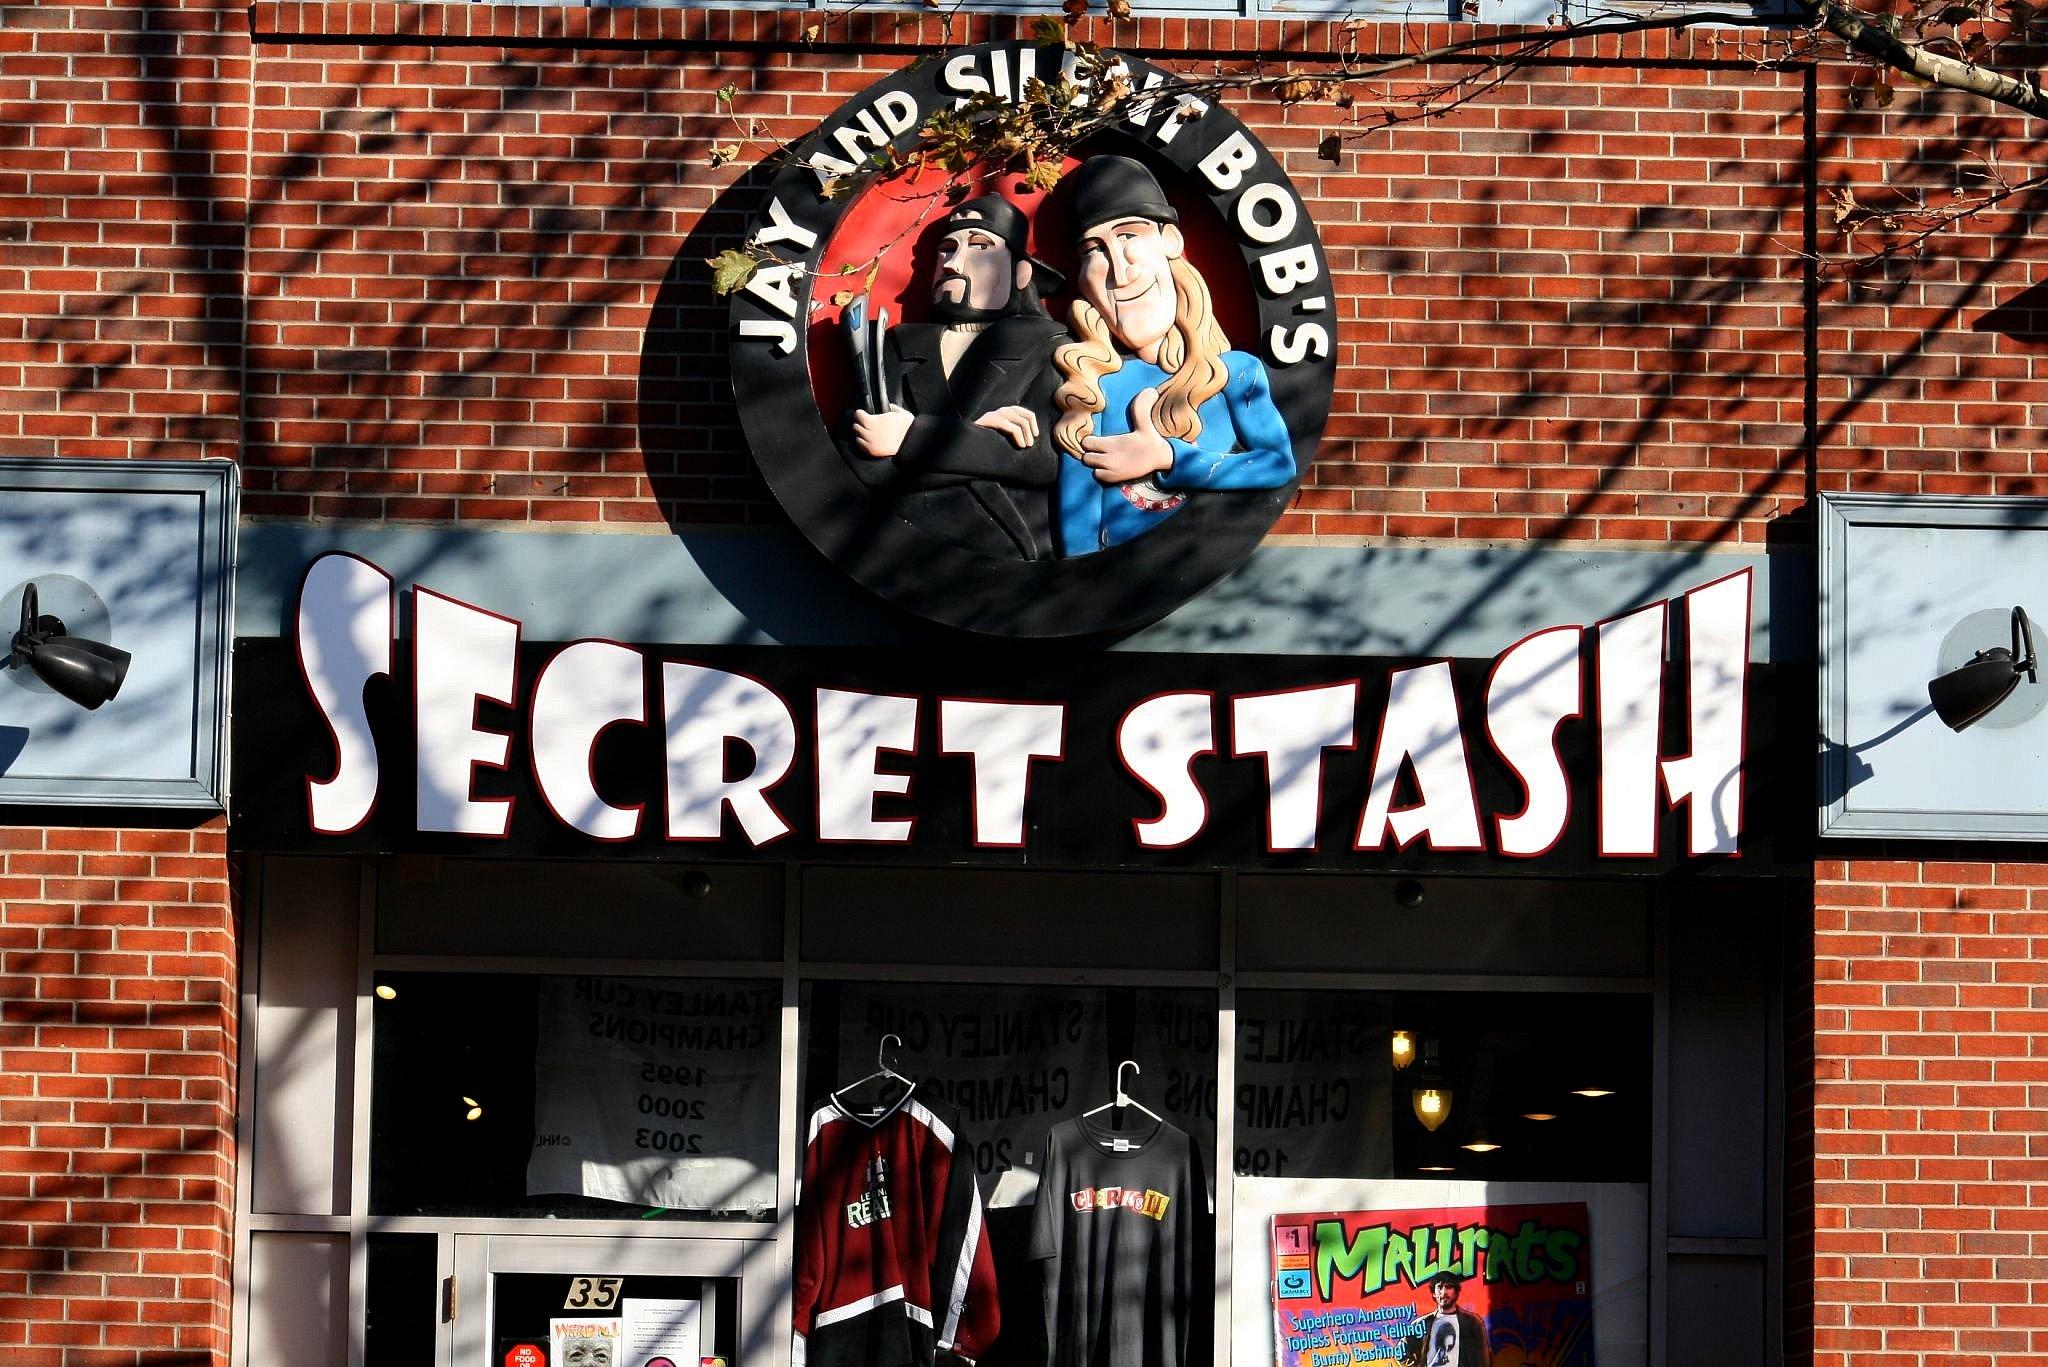 Ming Chen Comic Book Men Jay and Silent Bob's Secret Stash